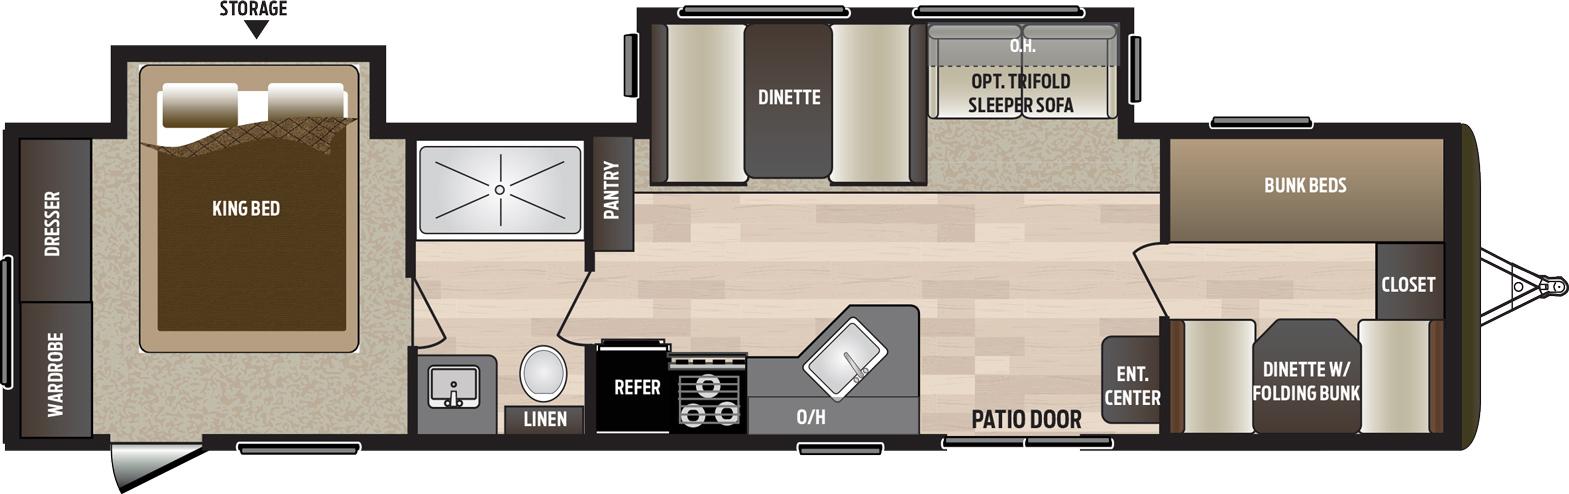 2019 KEYSTONE HIDEOUT 38BHDS (bunks) Floorplan